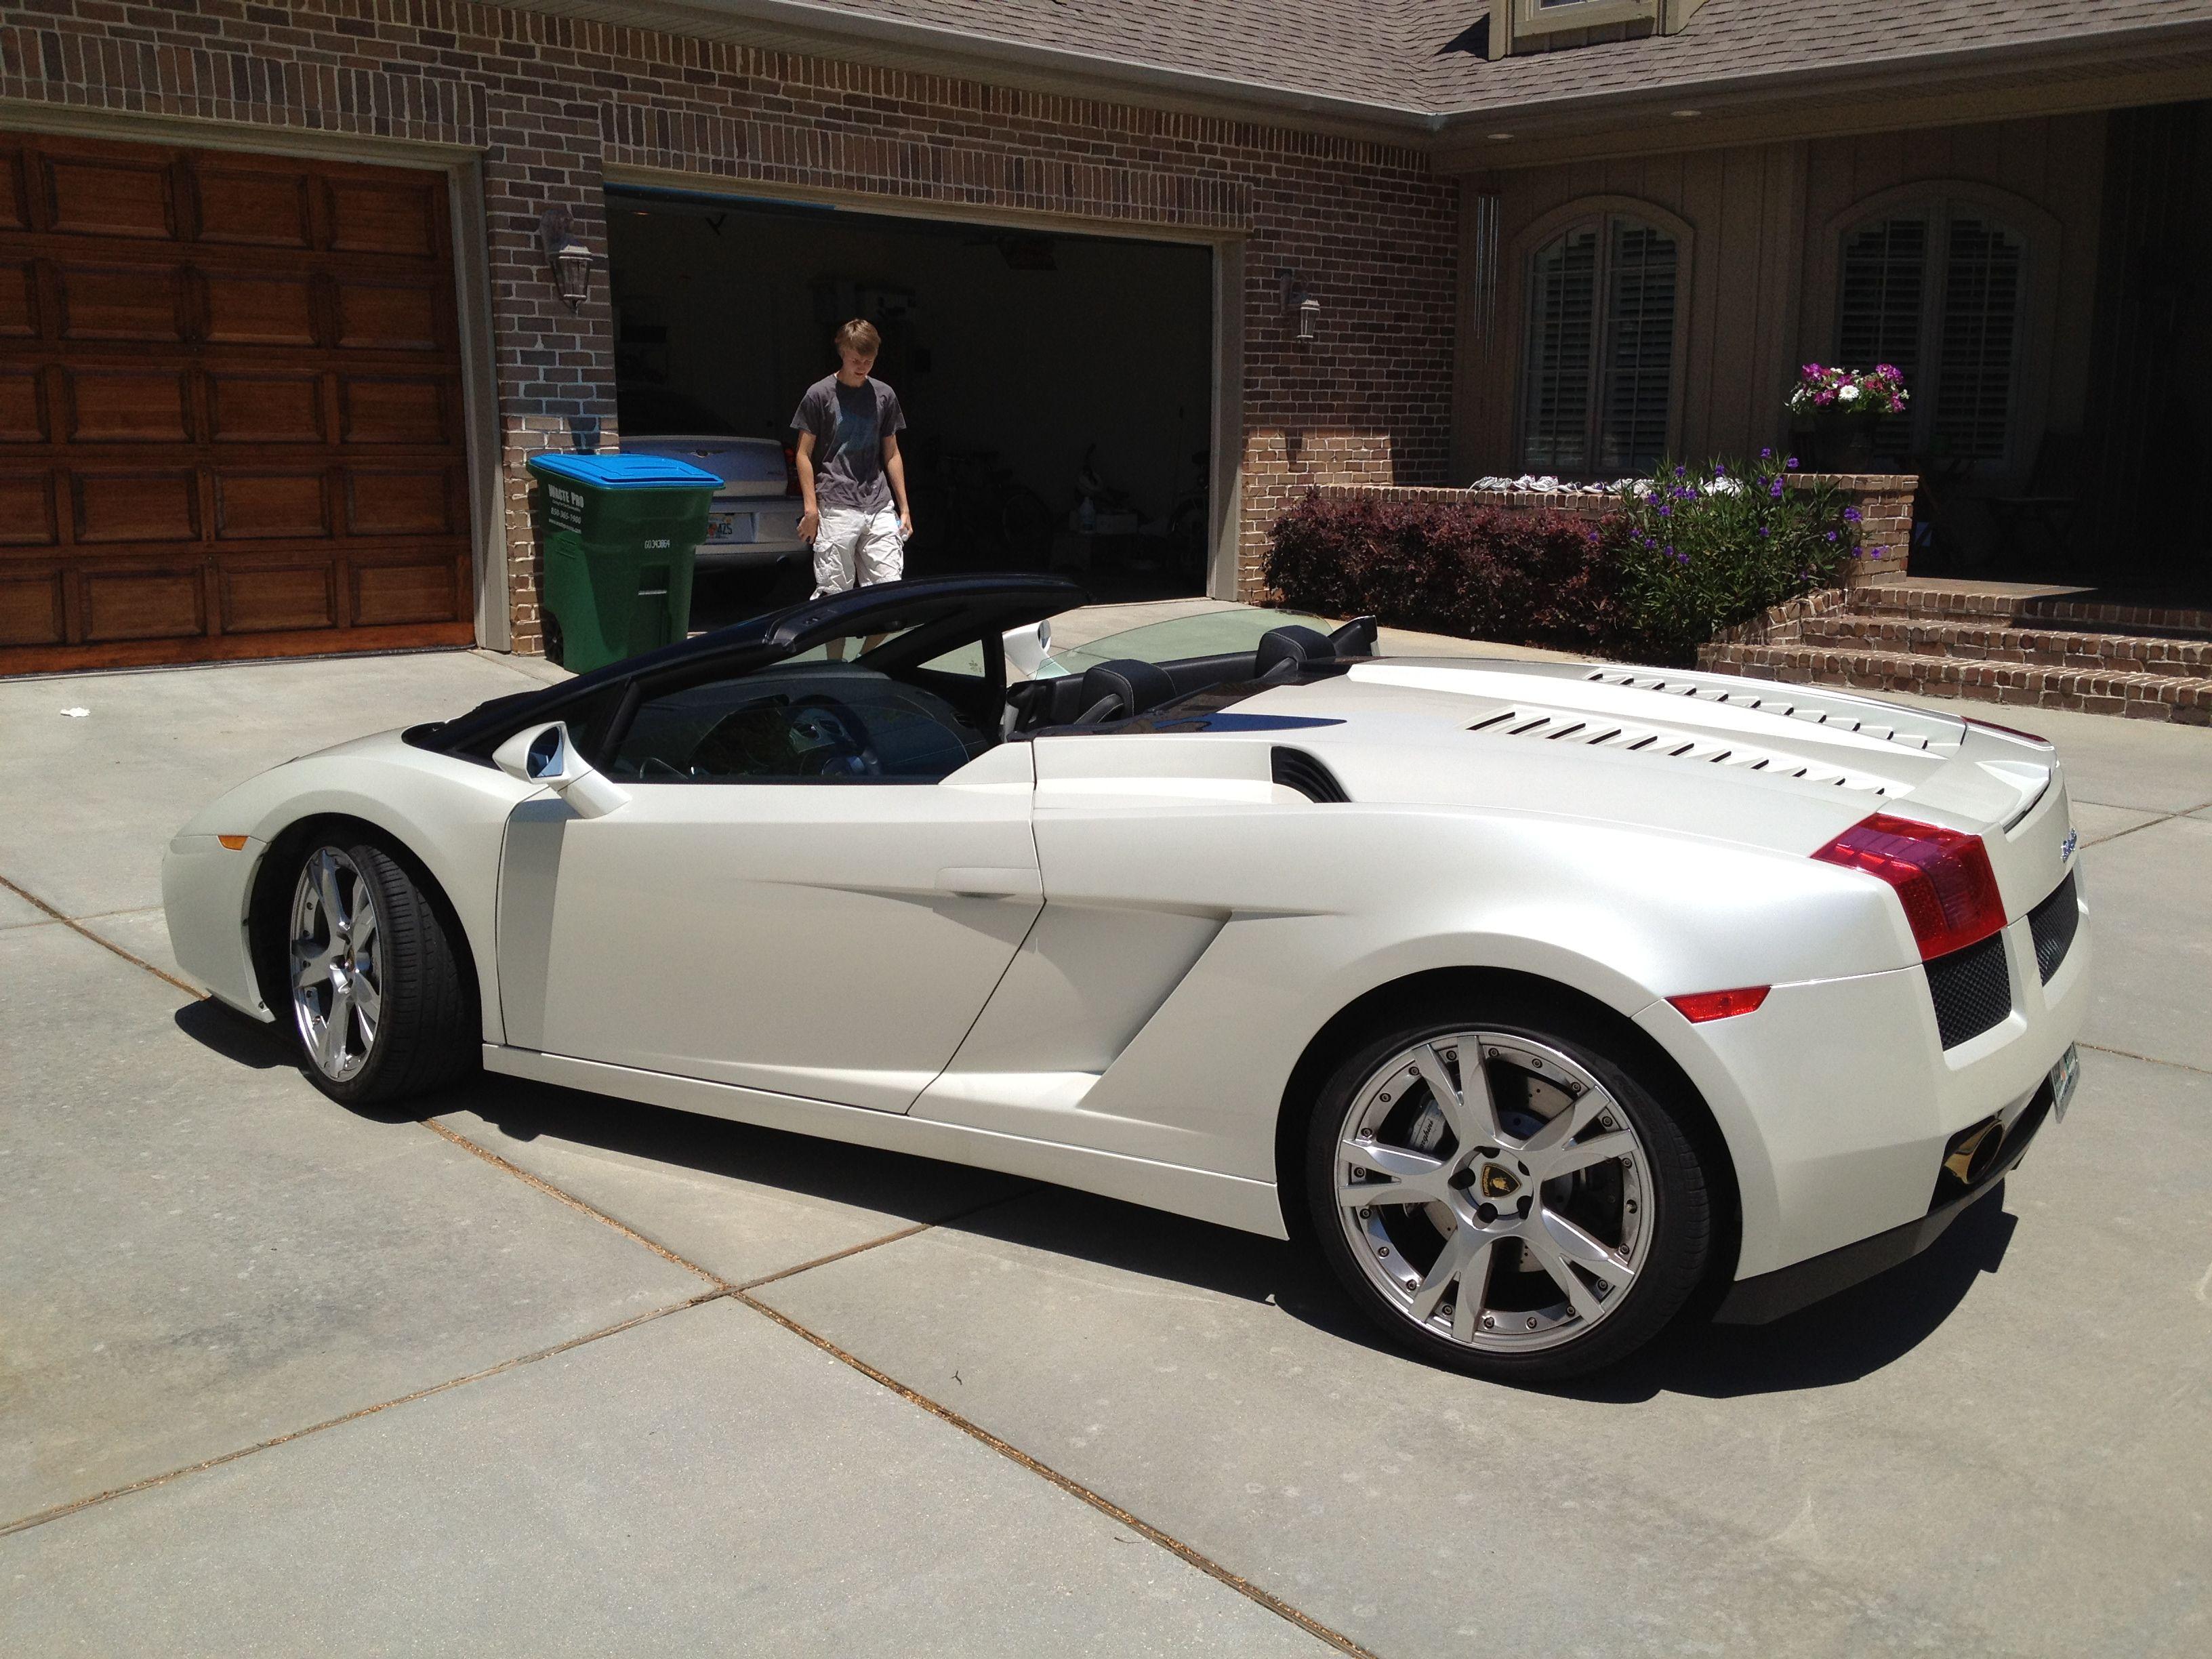 lamborghini com promoted for sale a en ext cars items mansory n r y m carbonado o apertos convertible range s